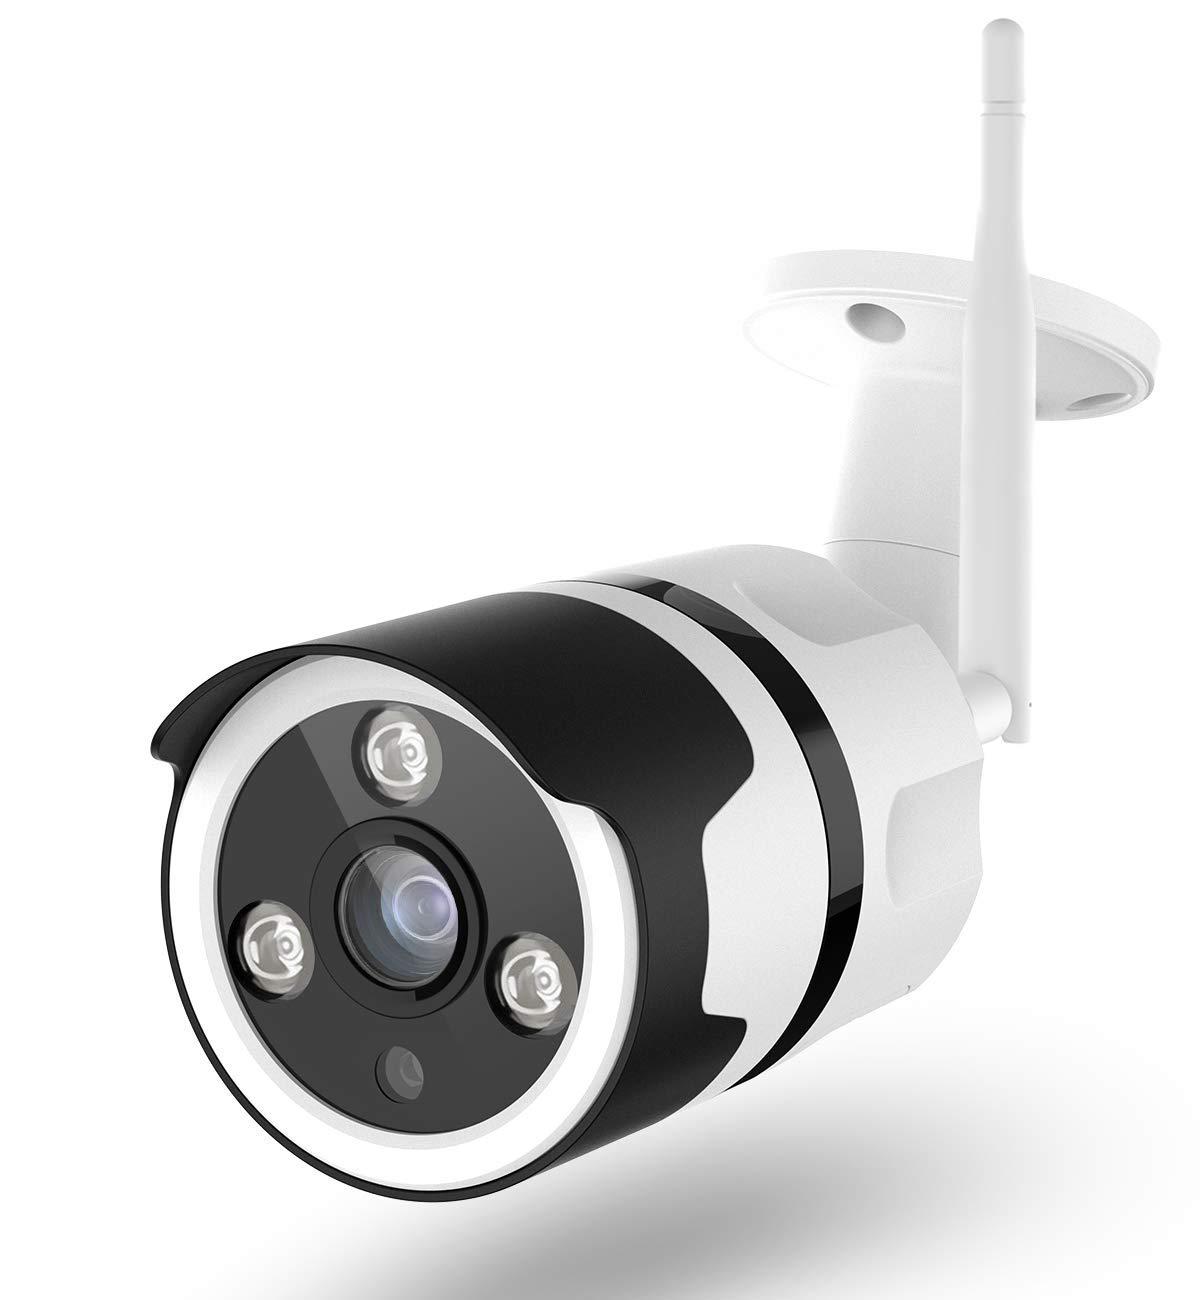 Outdoor Security Camera, 1080P Surveillance Cameras Outdoor WiFi Camera Two-Way Audio, IP66 Waterproof, Night Vision, Motion Detection, Cloud Storage 24s Smart-Clip, Security Camera Alexa Compatible by NETVUE